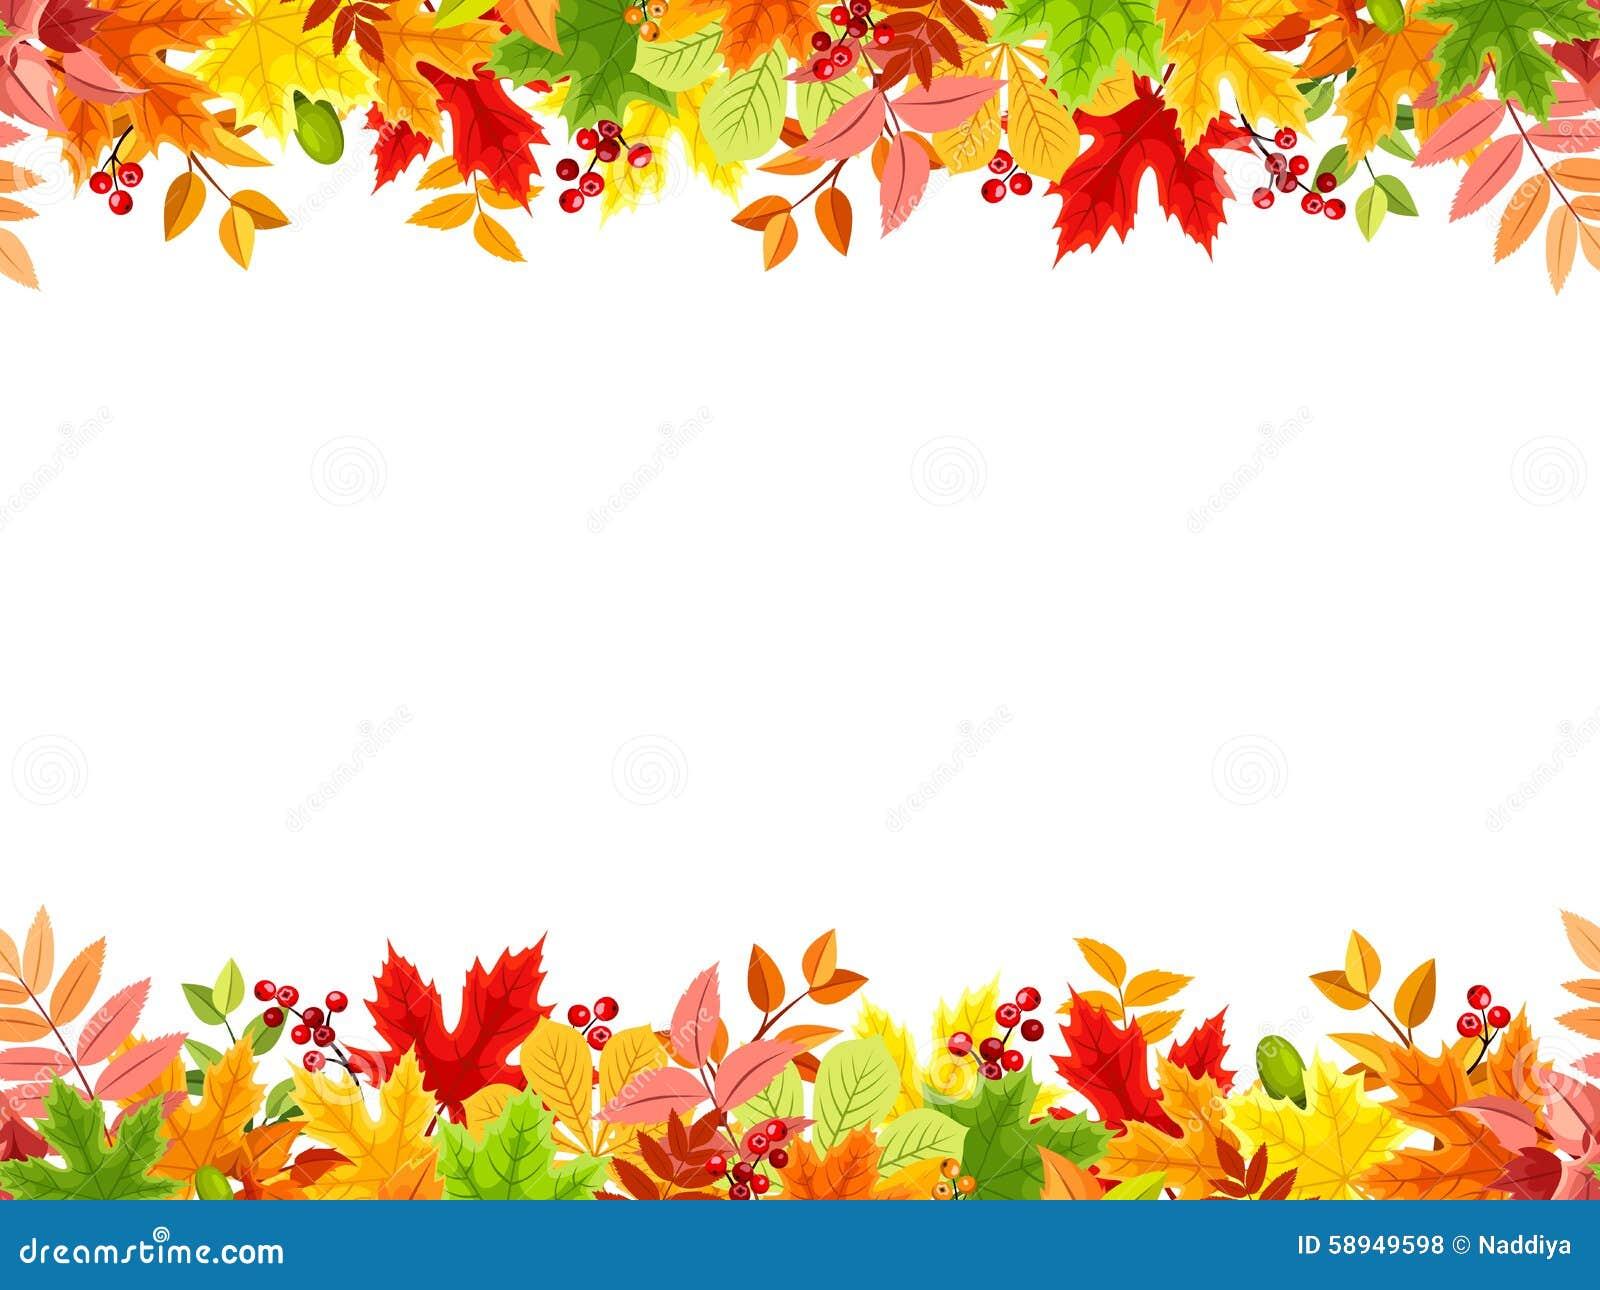 horizontaler nahtloser hintergrund mit buntem herbstlaub fall leaf clipart free vector fall leaf clipart free vector